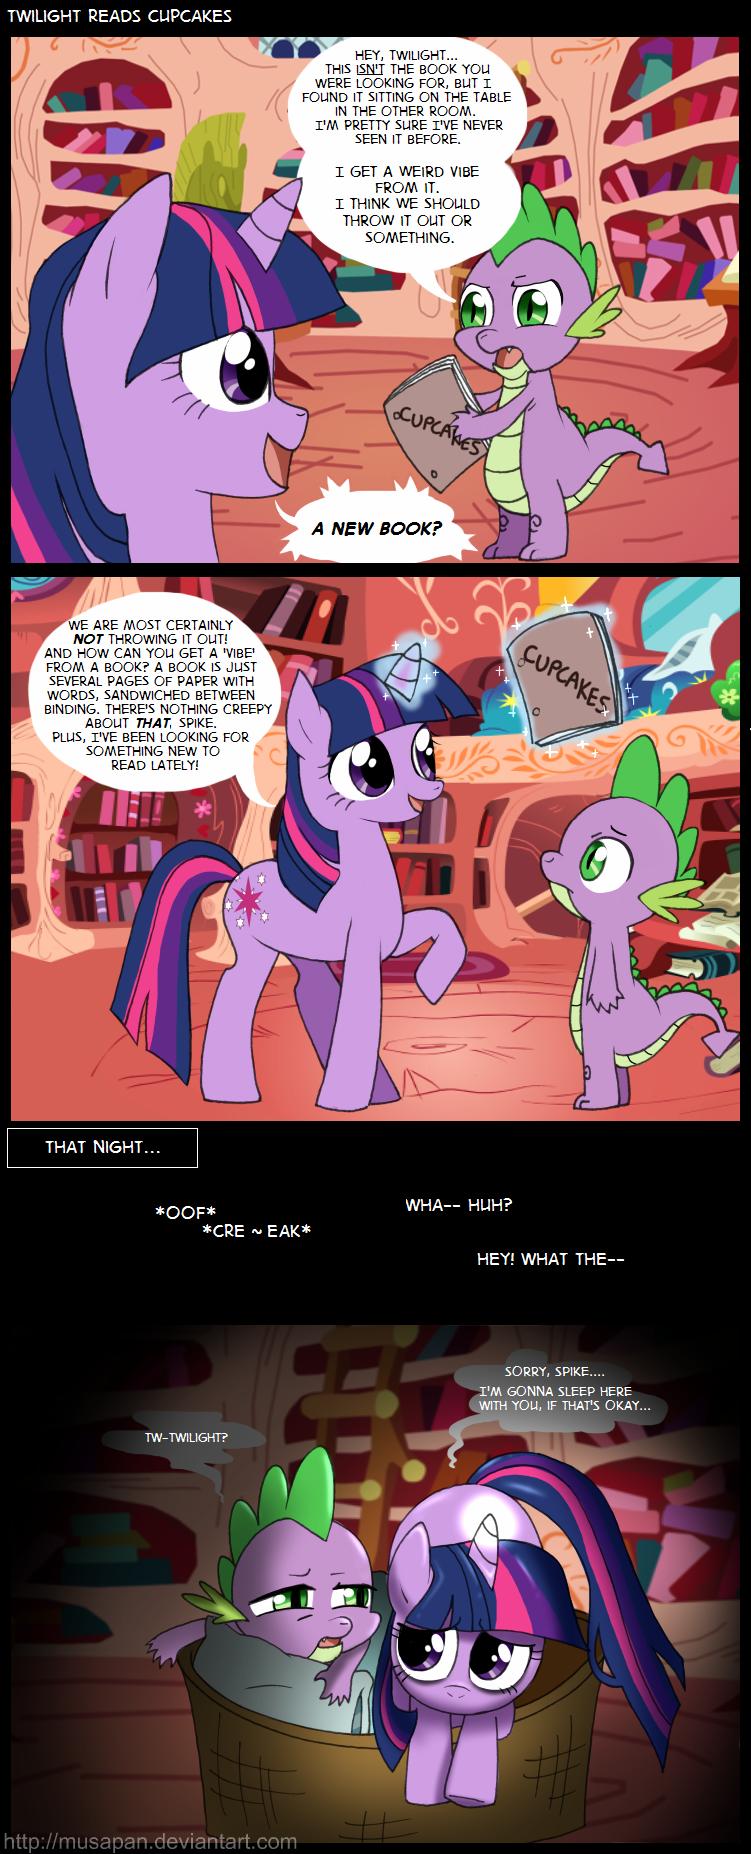 MLP Comics Twilight Reads Cupcakes